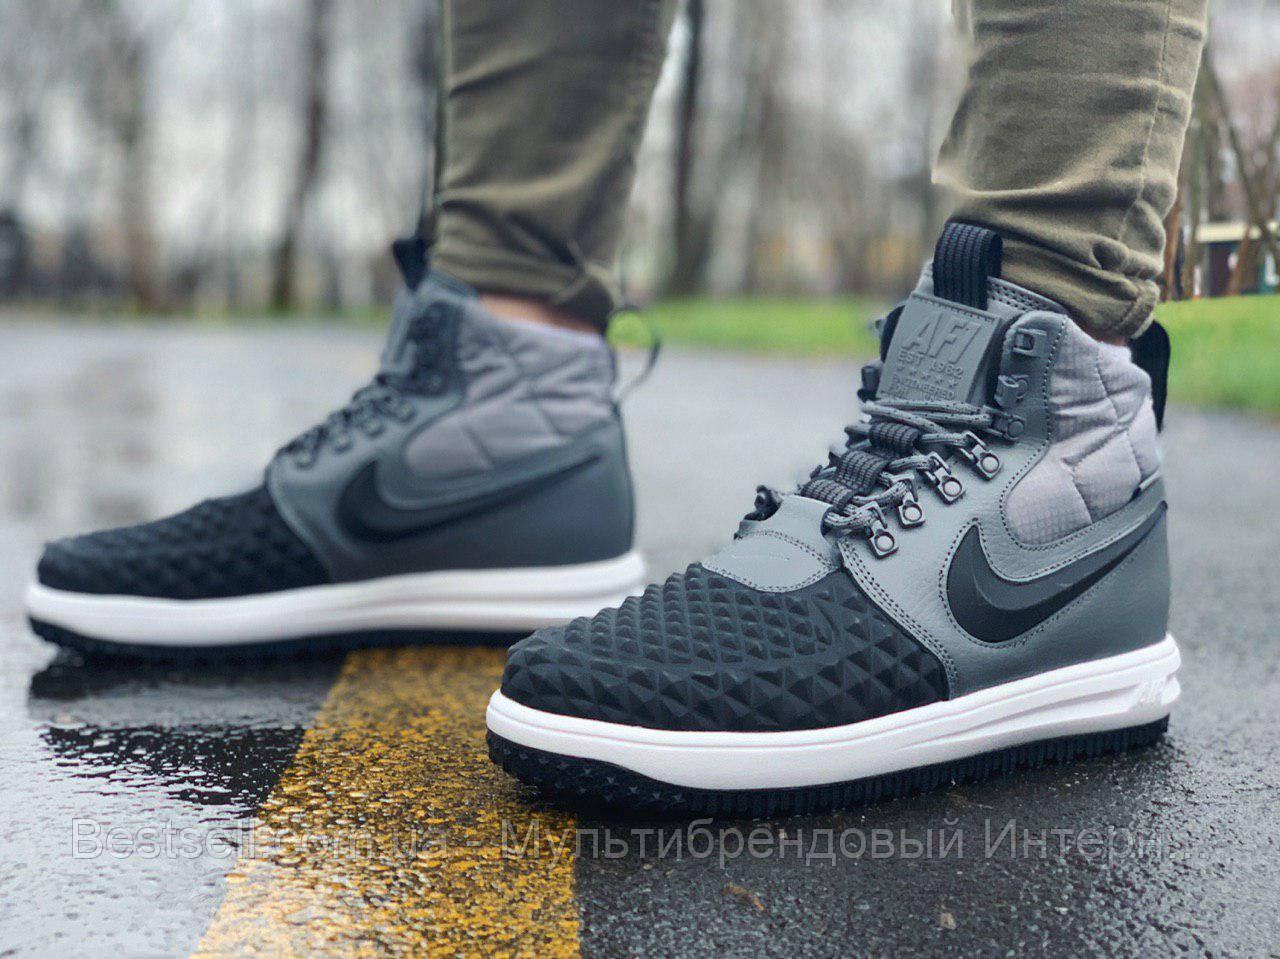 Кросівки Nike Lunar Force 1 Найк Лунар Форс (41,43,45)